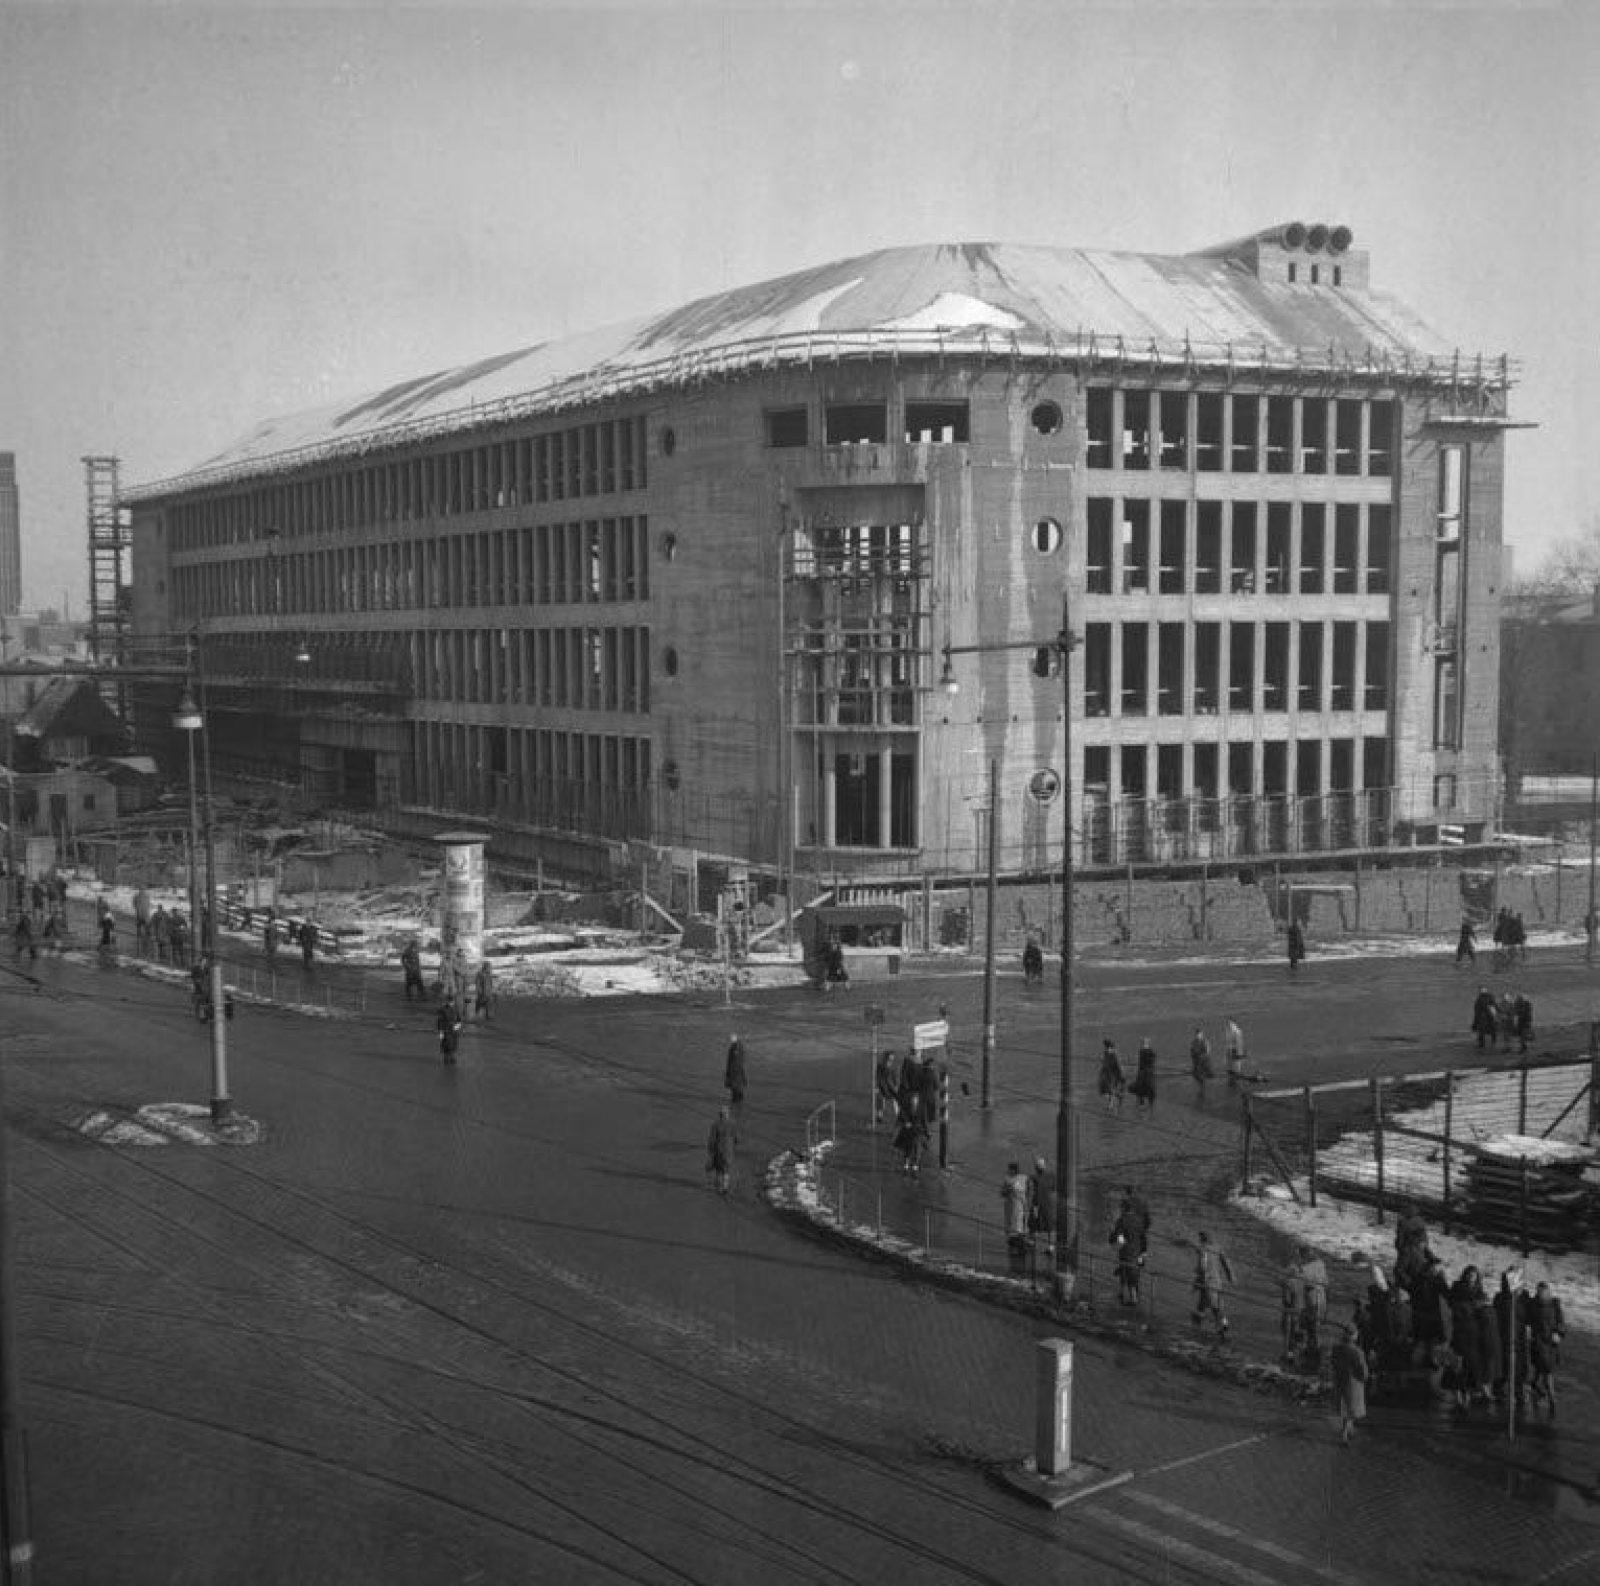 1947 03 Rotterdamsche Bank DGG NL Rt SA 4204 109 2 01